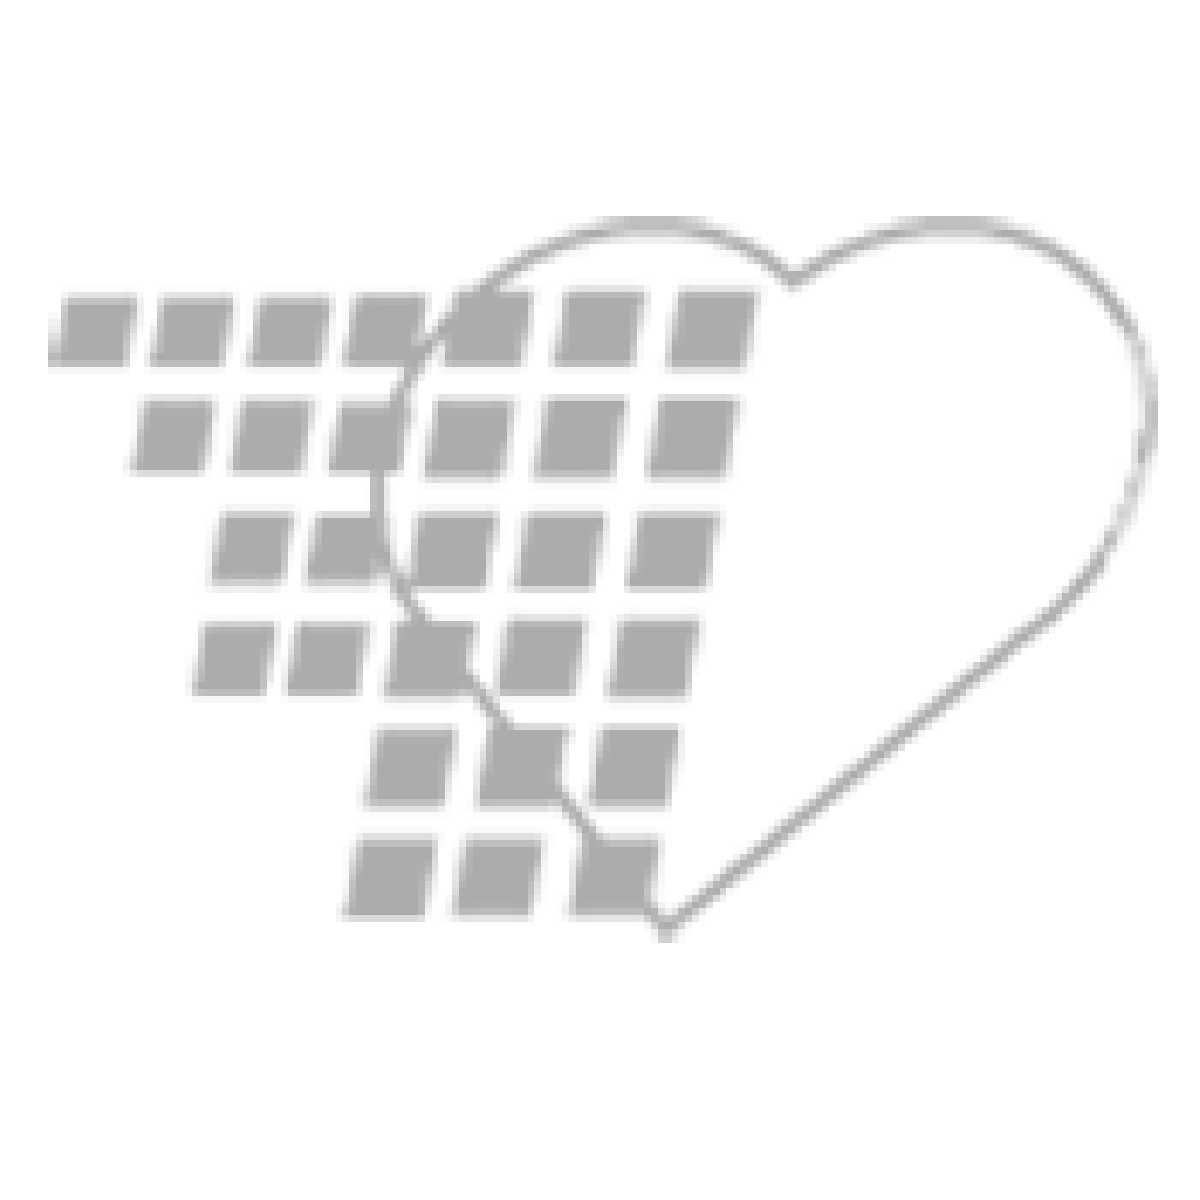 02-80-604 ADC Adscope® Pediatric Stethoscope